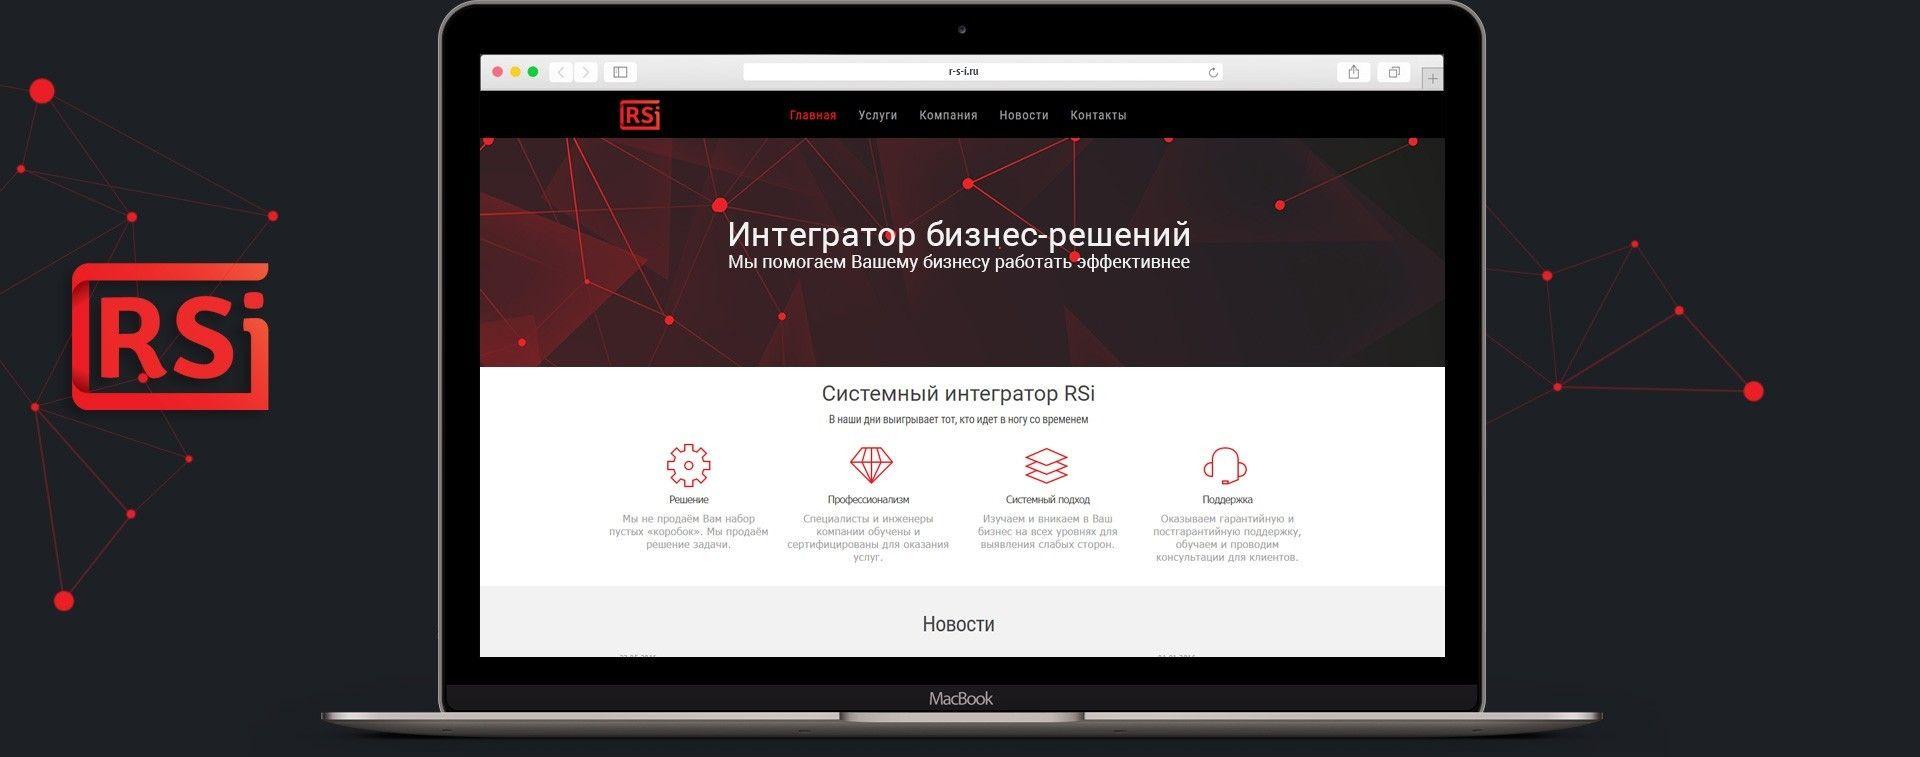 Дизайн сайта RSi